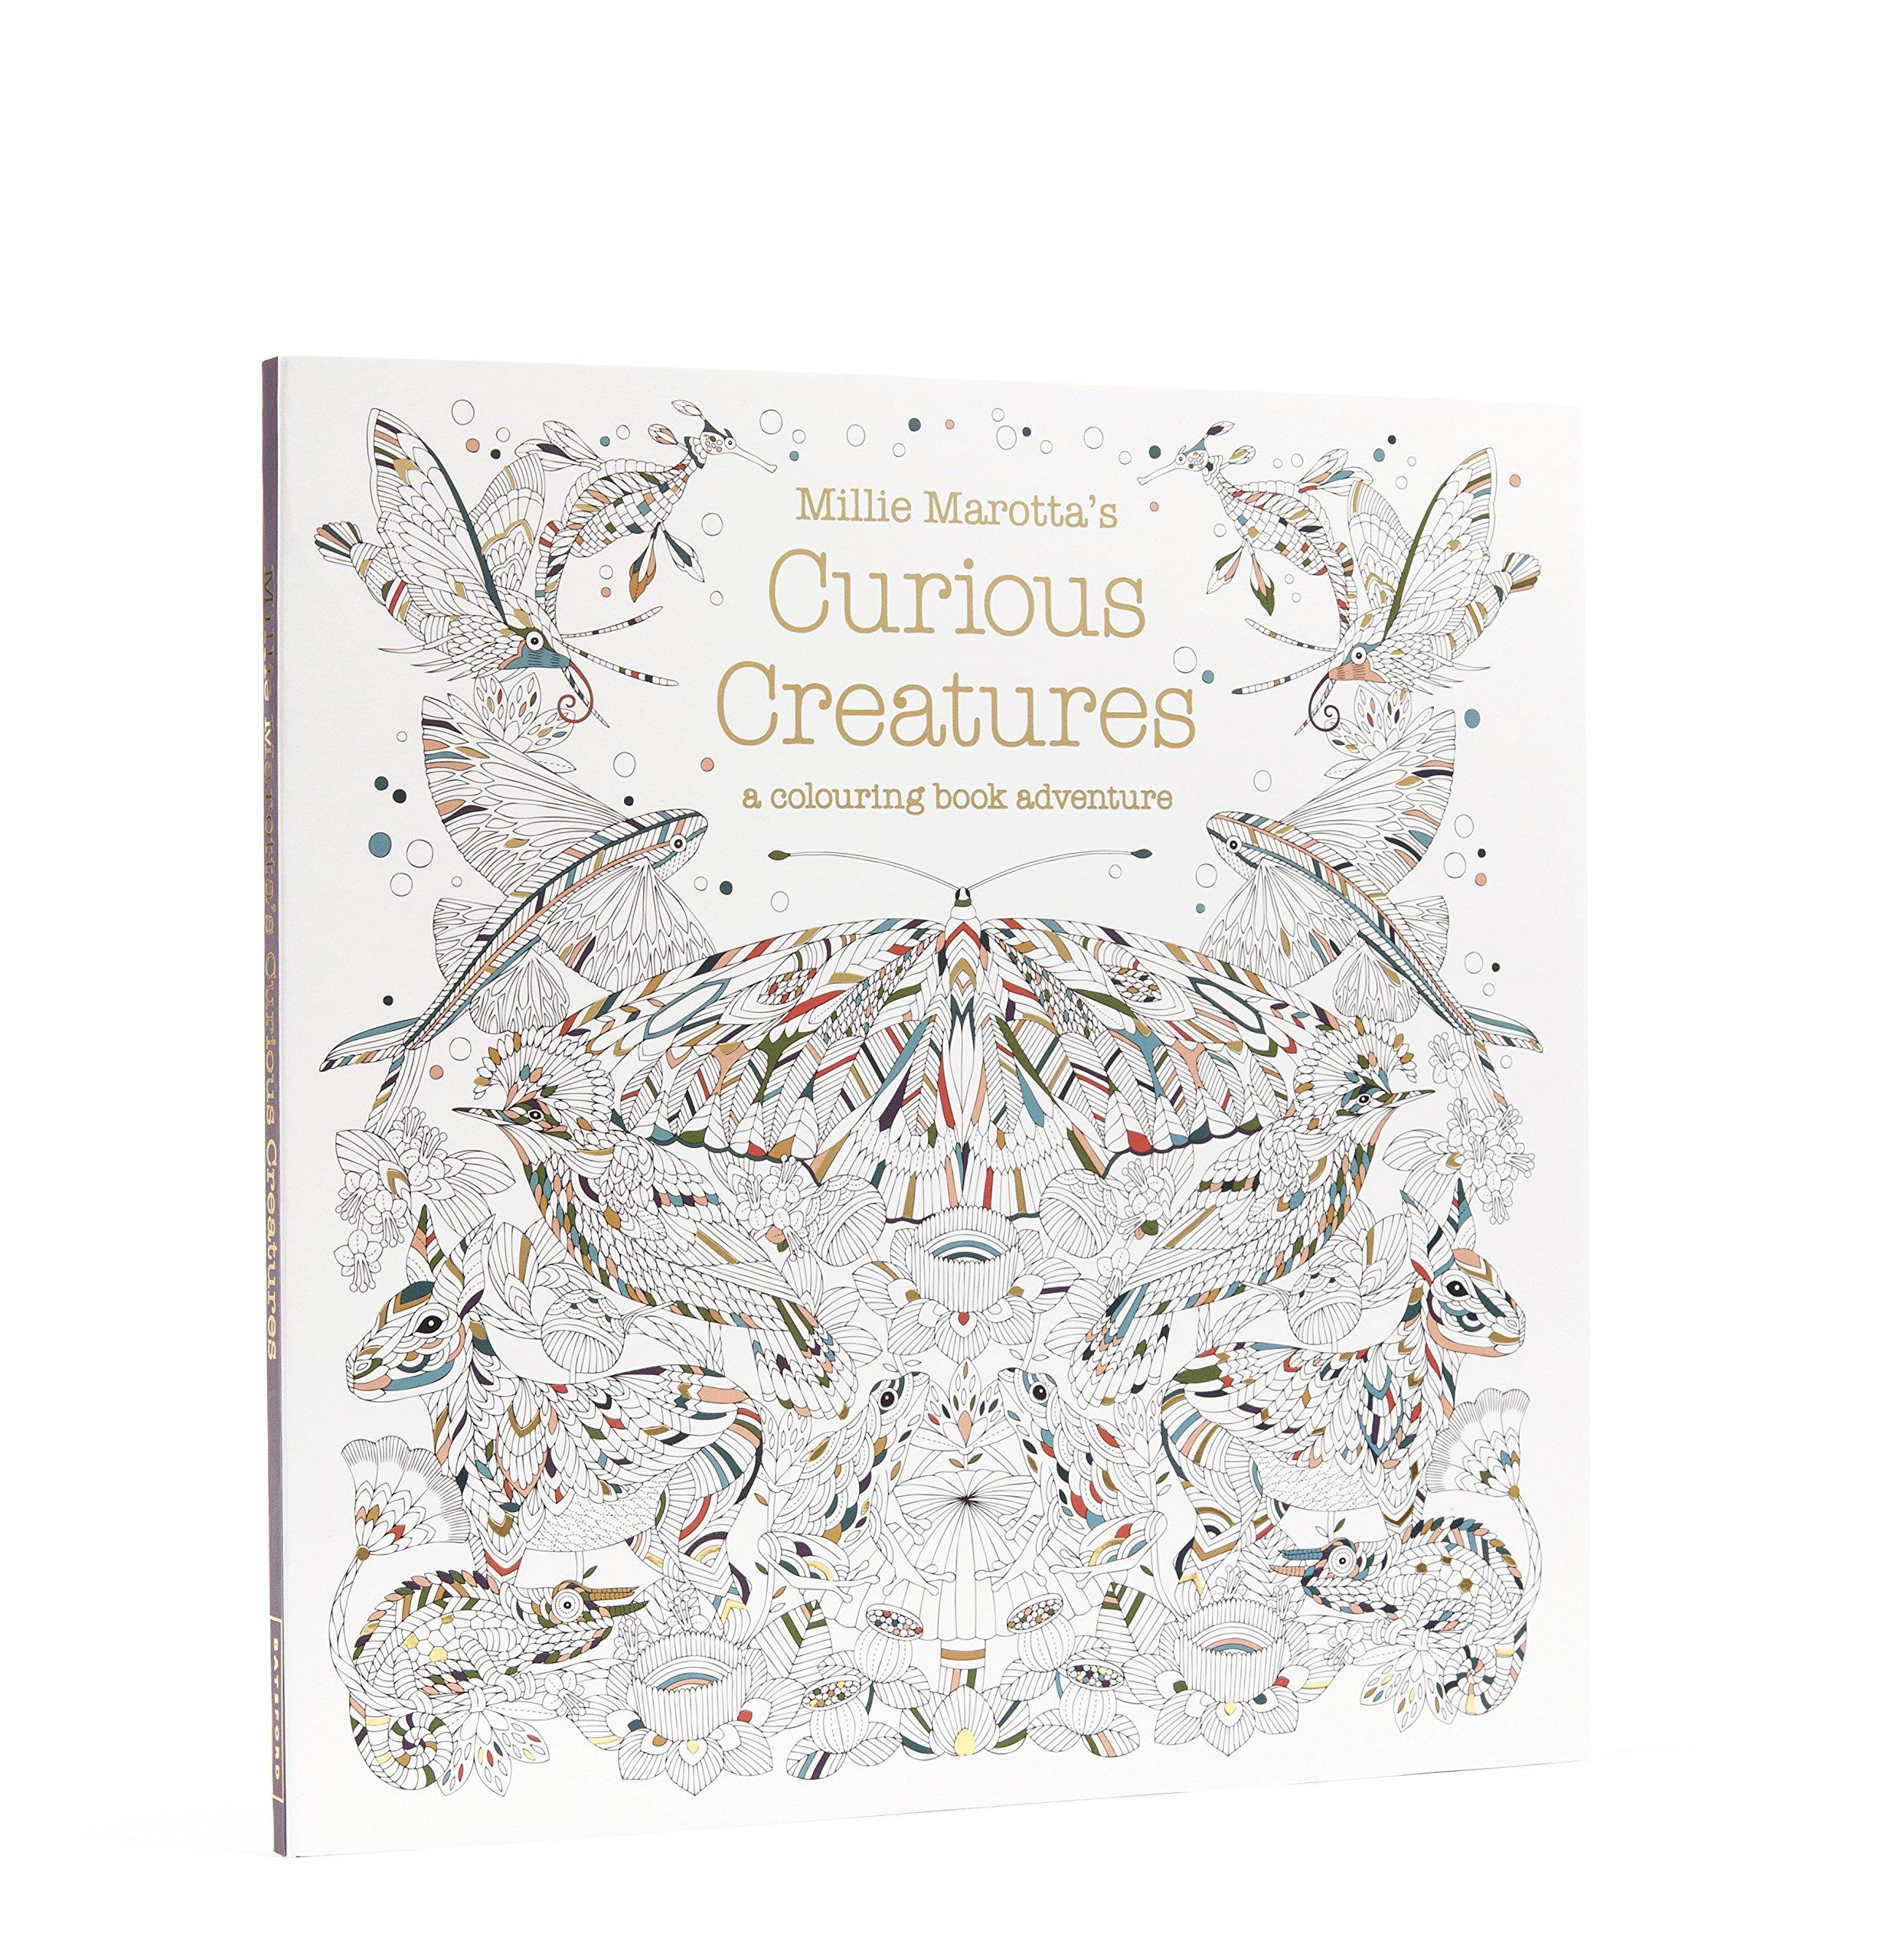 Millie Marottas Curious Creatures NA 9781849943659 Amazon Books